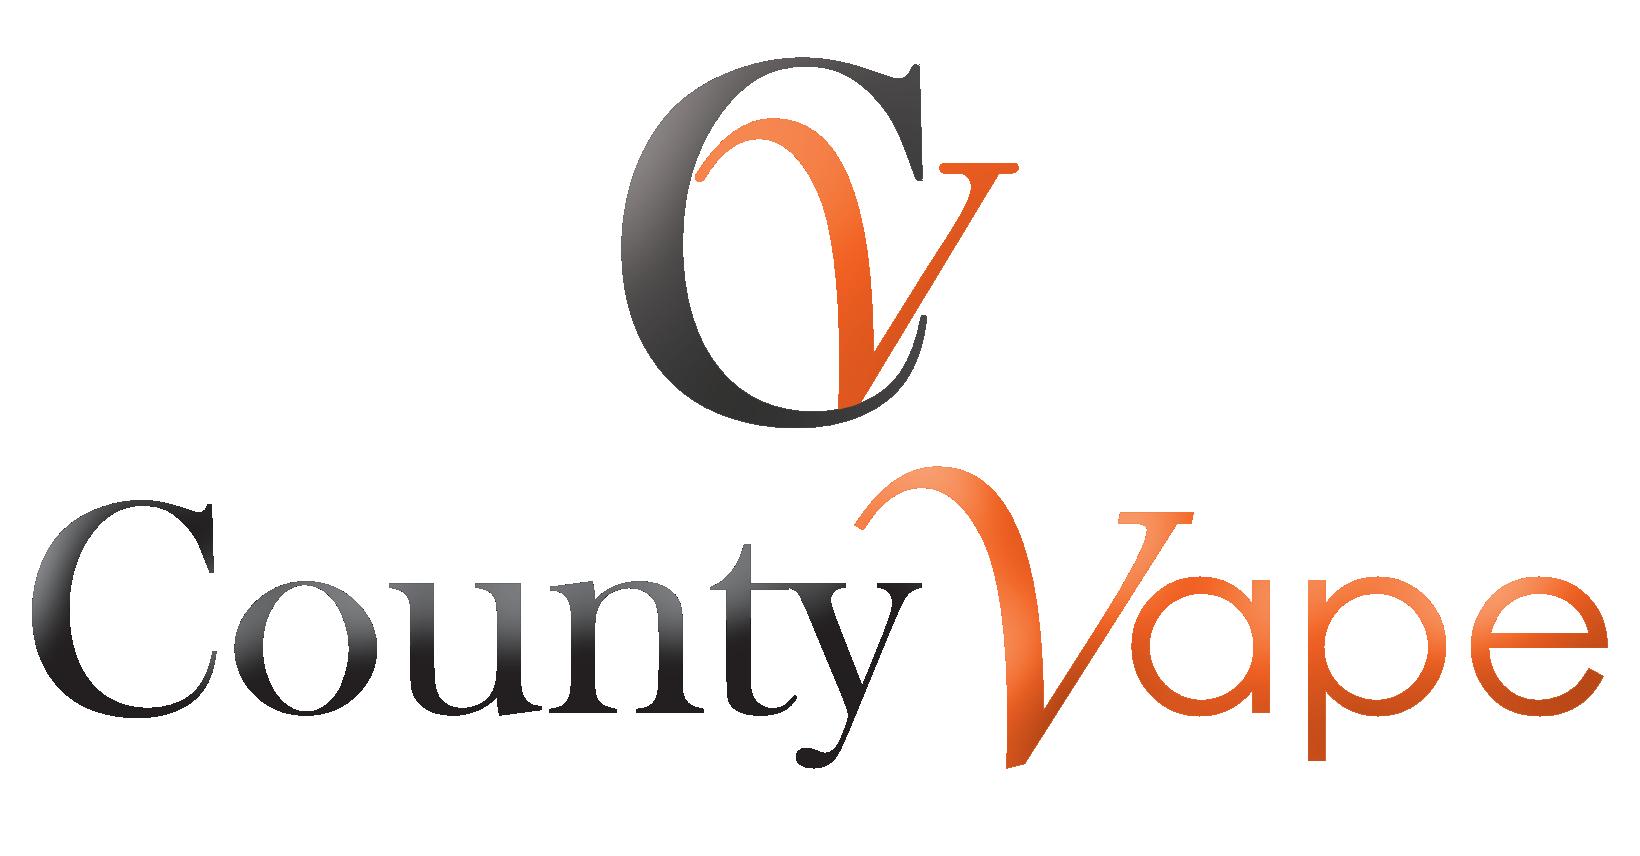 County Vape